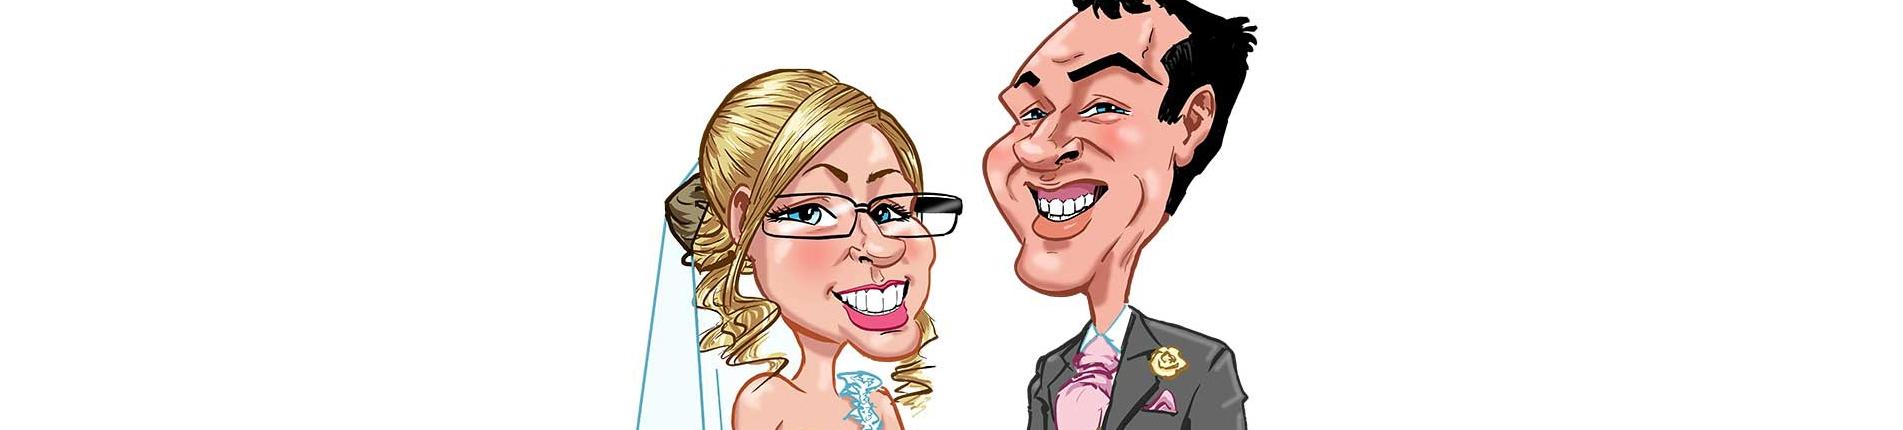 Caricature Wedding Message Board